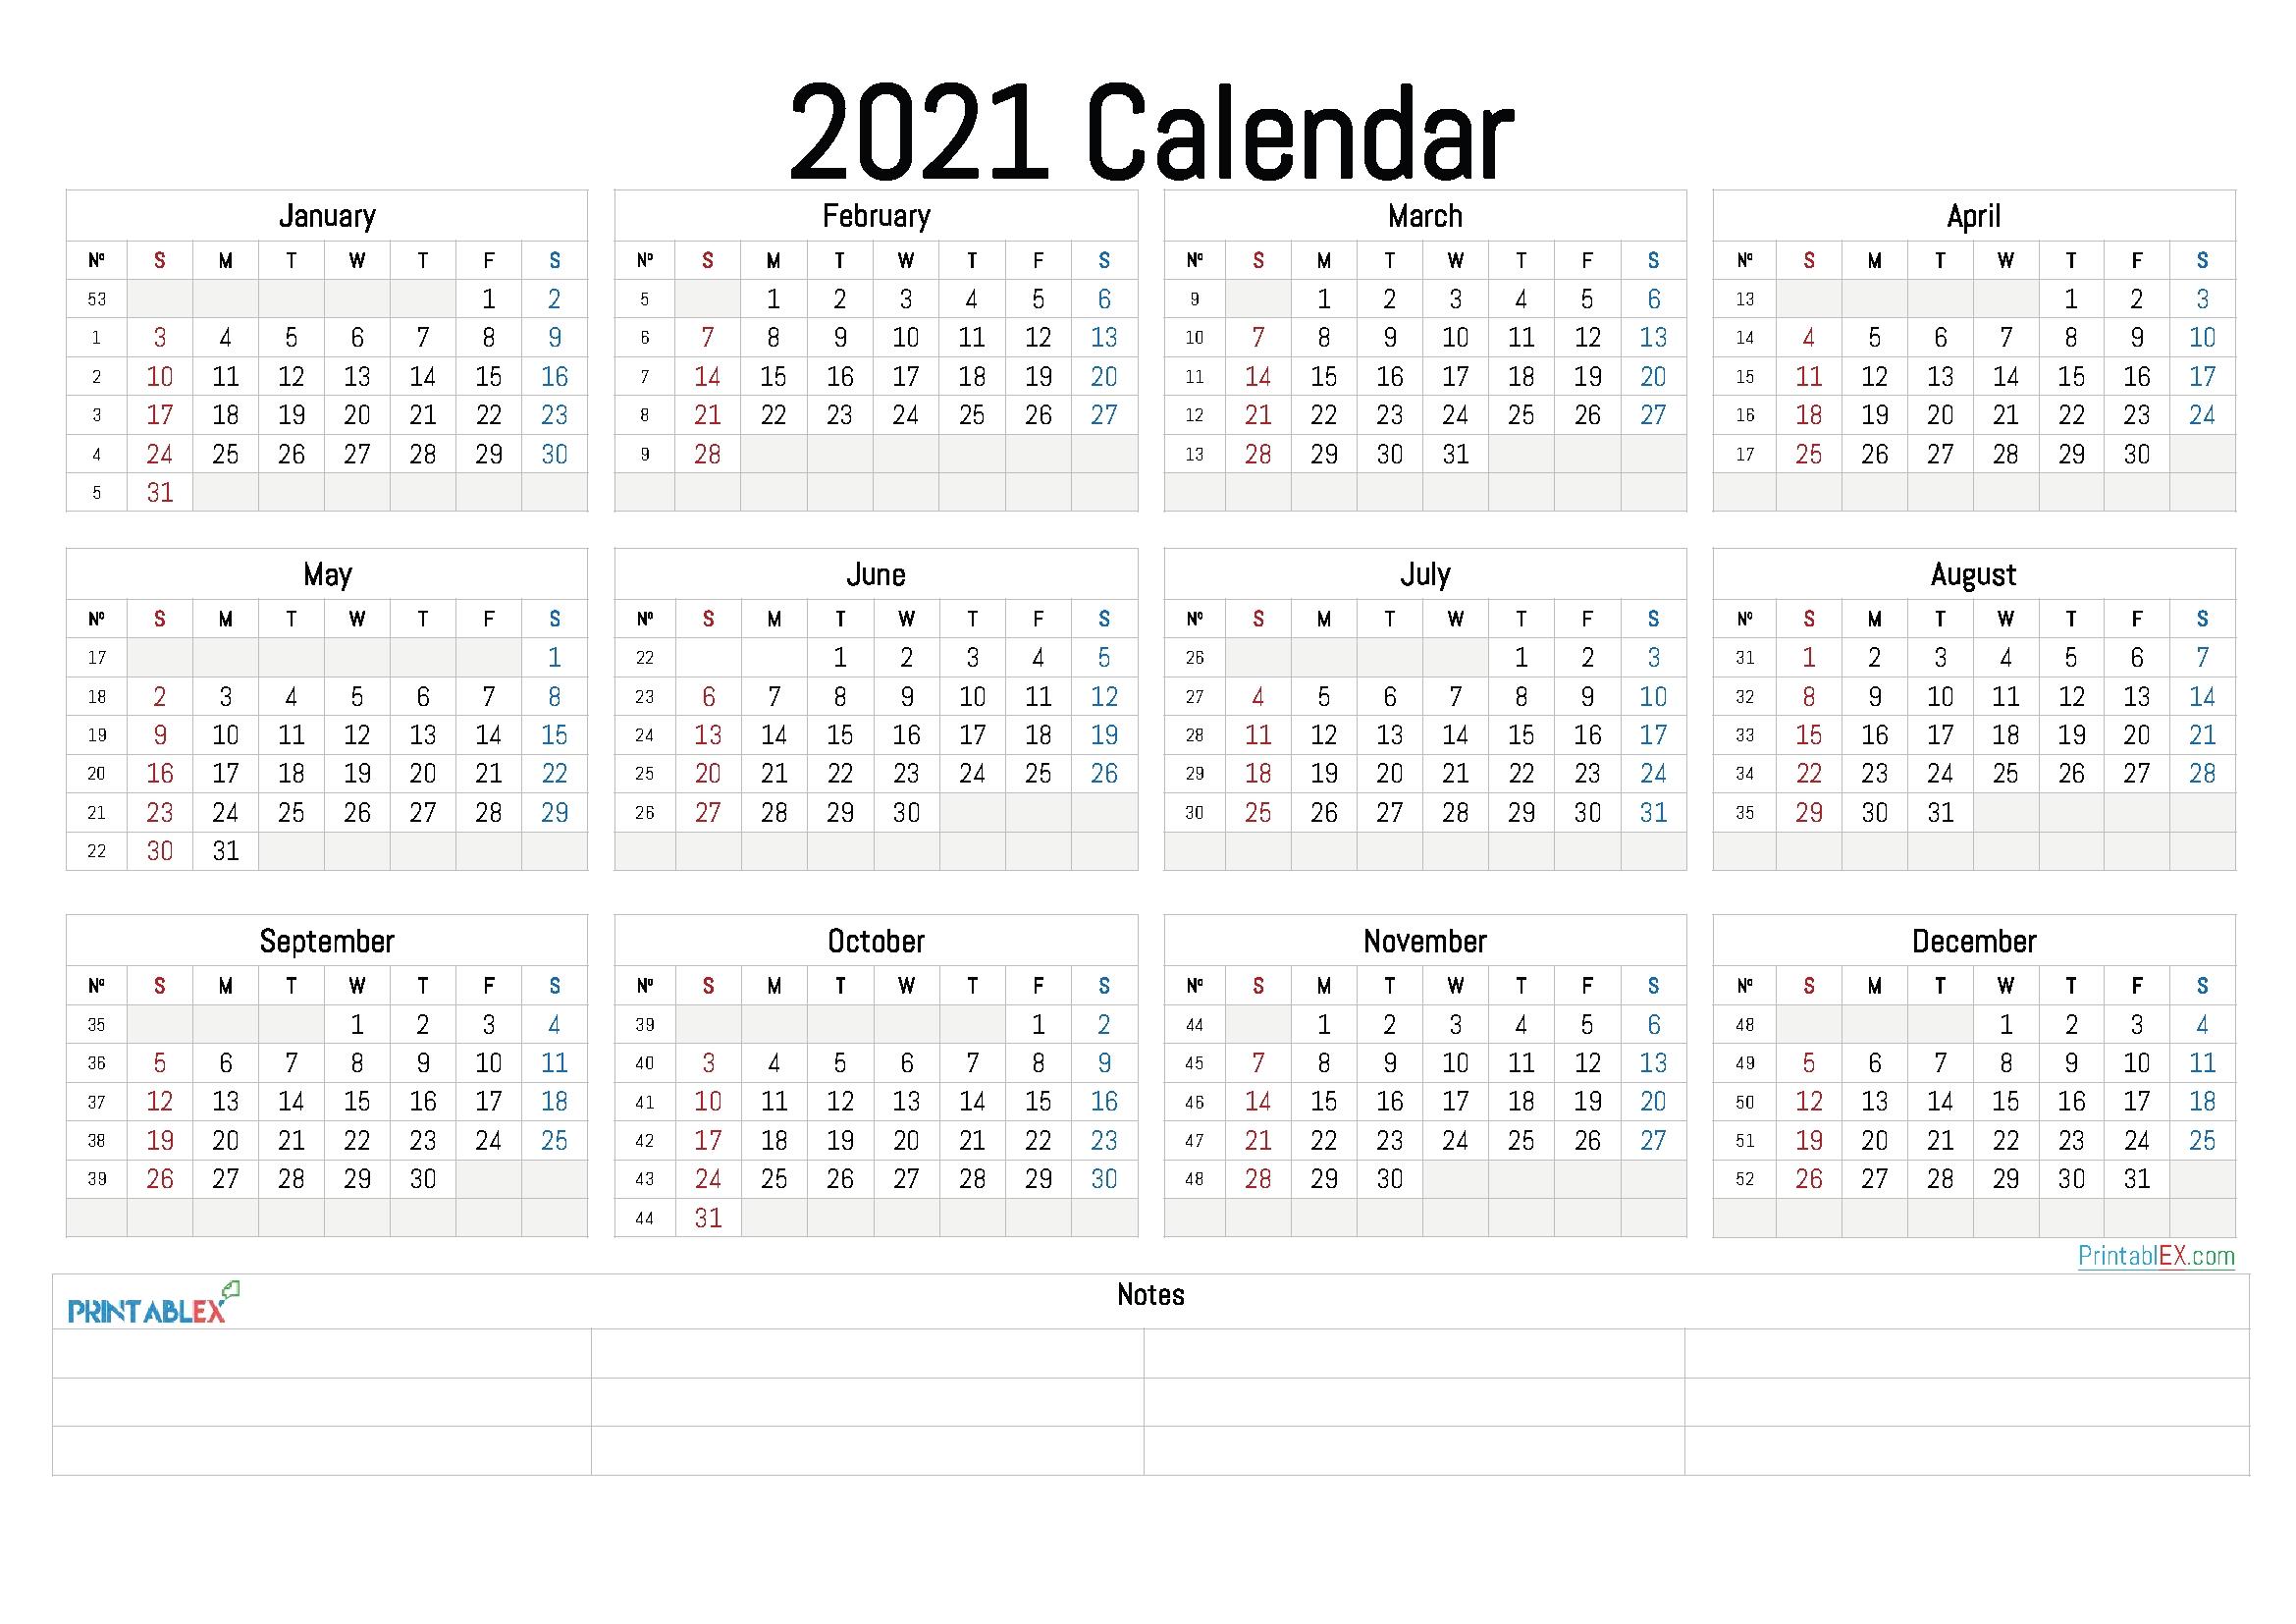 2021 Annual Calendar Printable – 21Ytw5 – Free 2020 And 2021